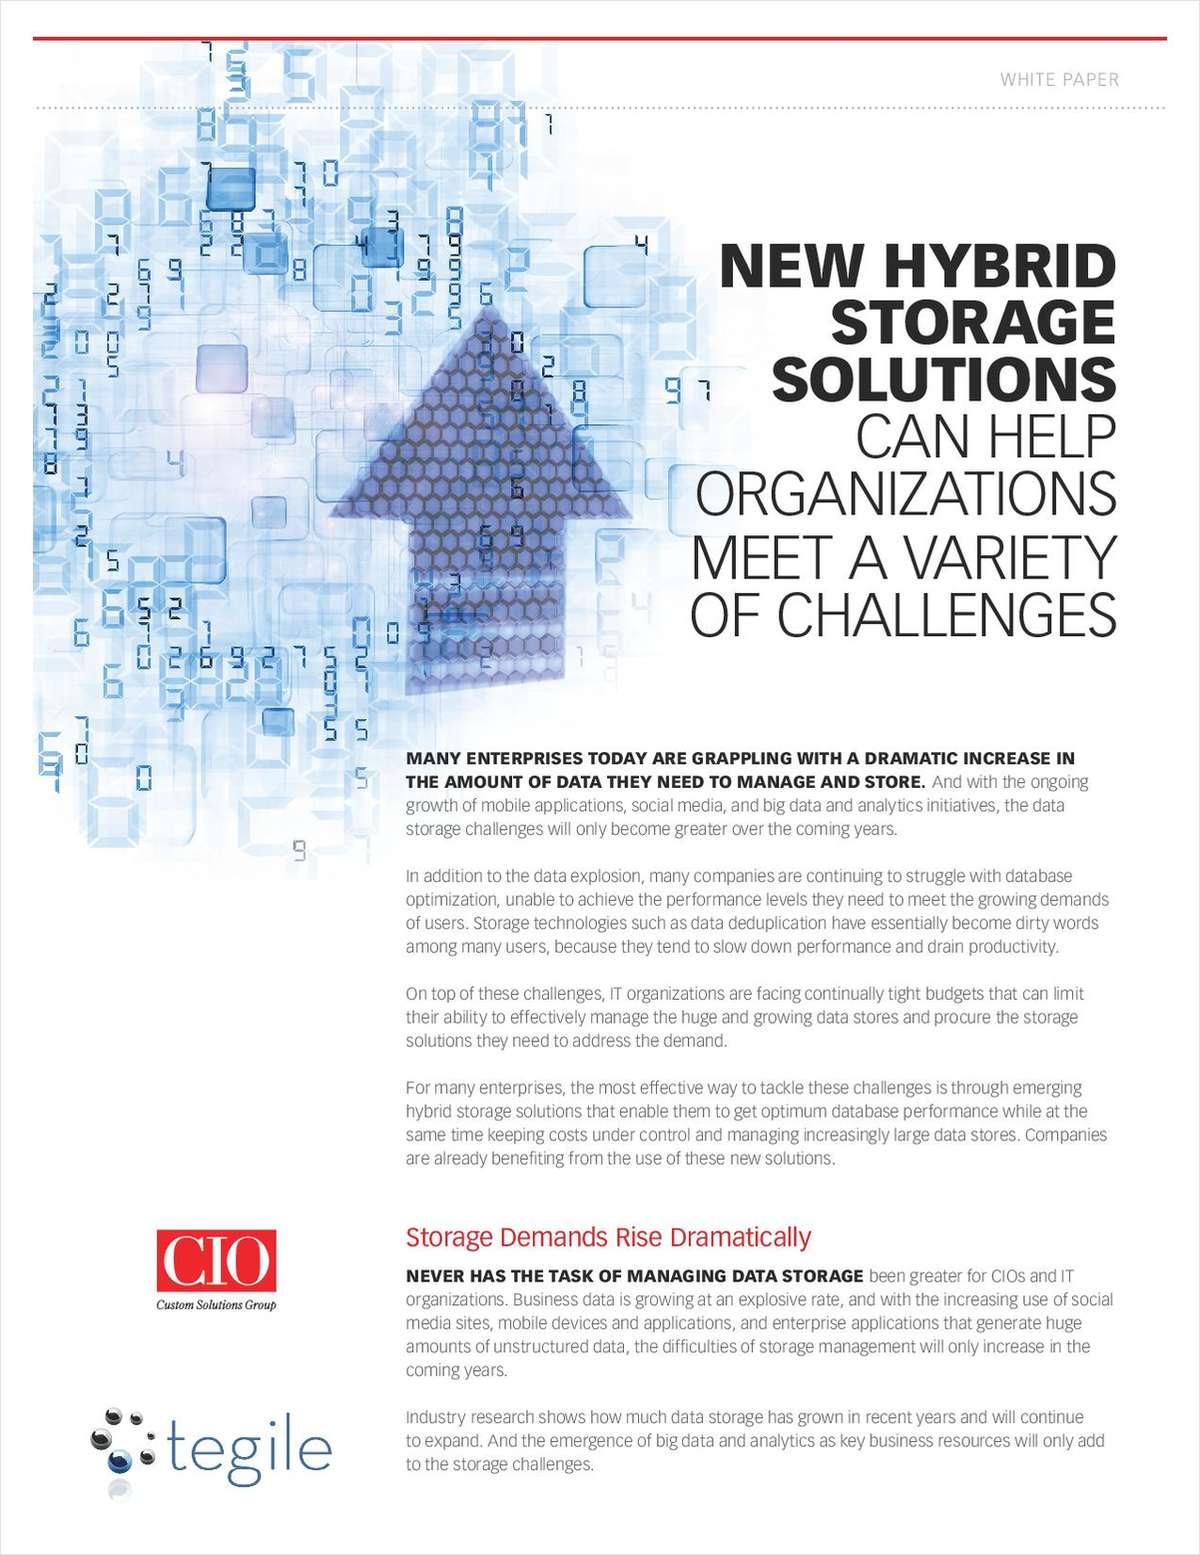 CIO: New Hybrid Storage Solutions